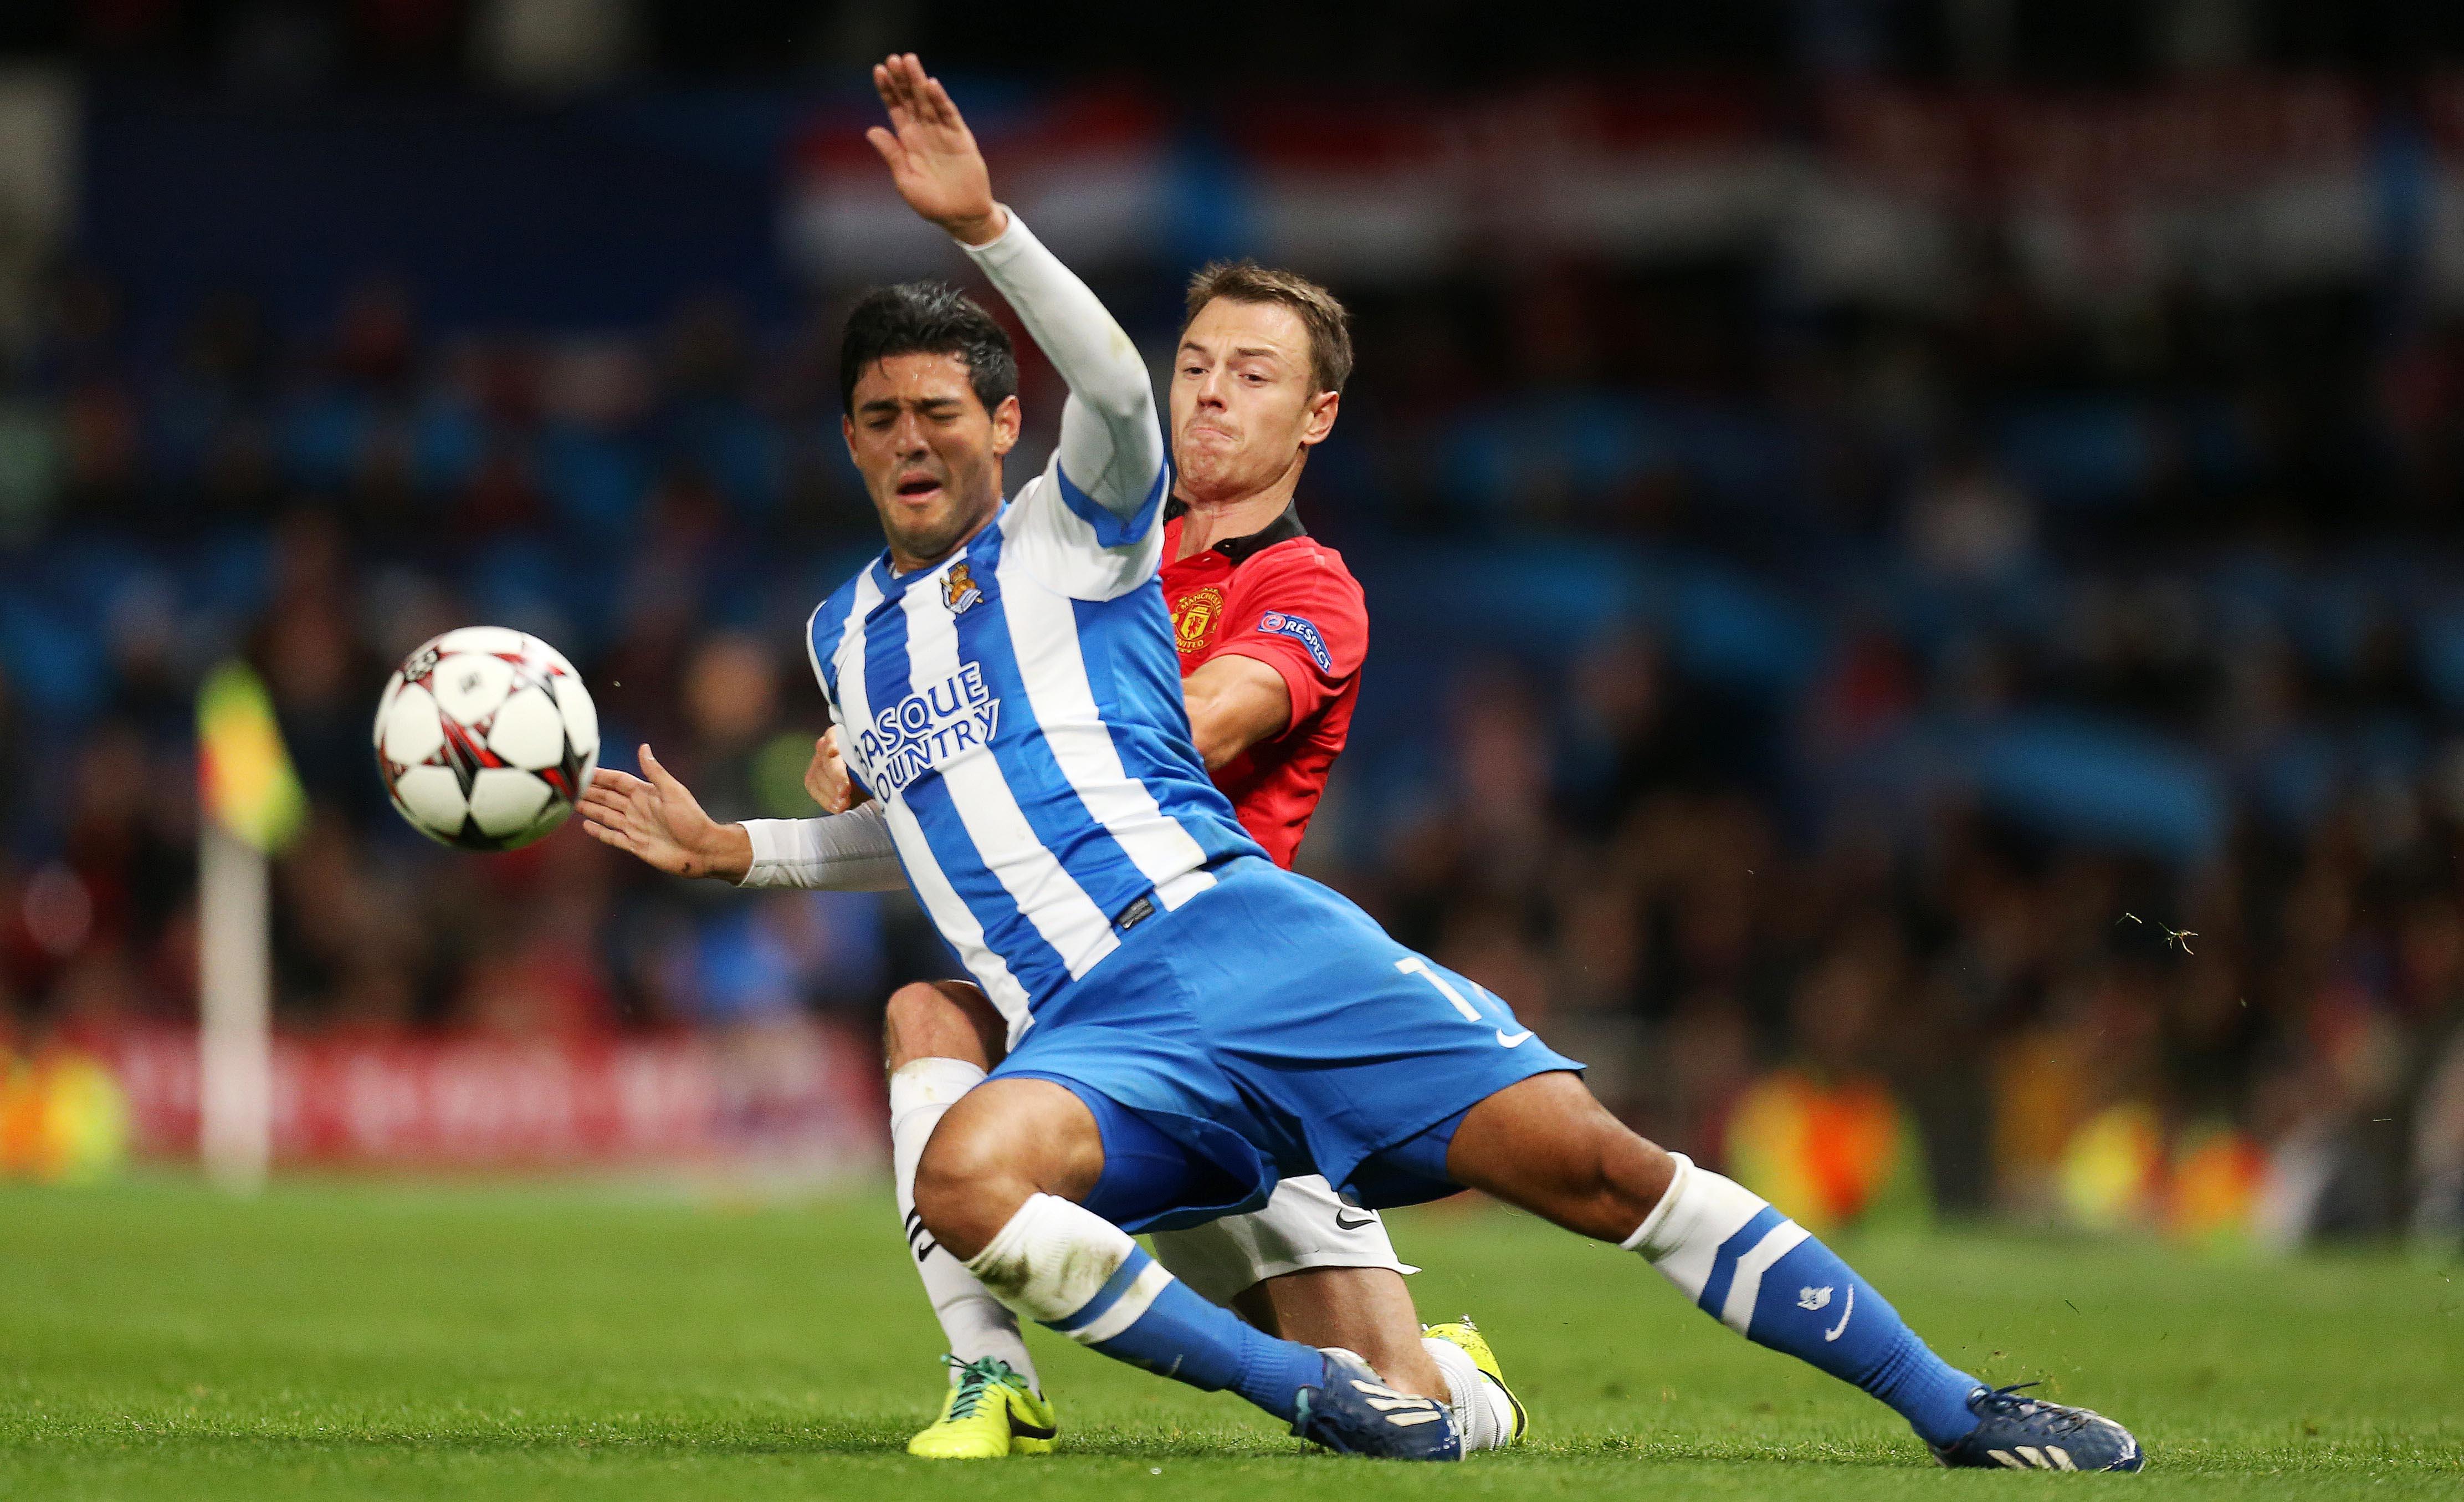 Mexico Star Carlos Vela Highlights Real Sociedad Roster for BBVA Compass Dynamo Charities Cup | Houston Dynamo